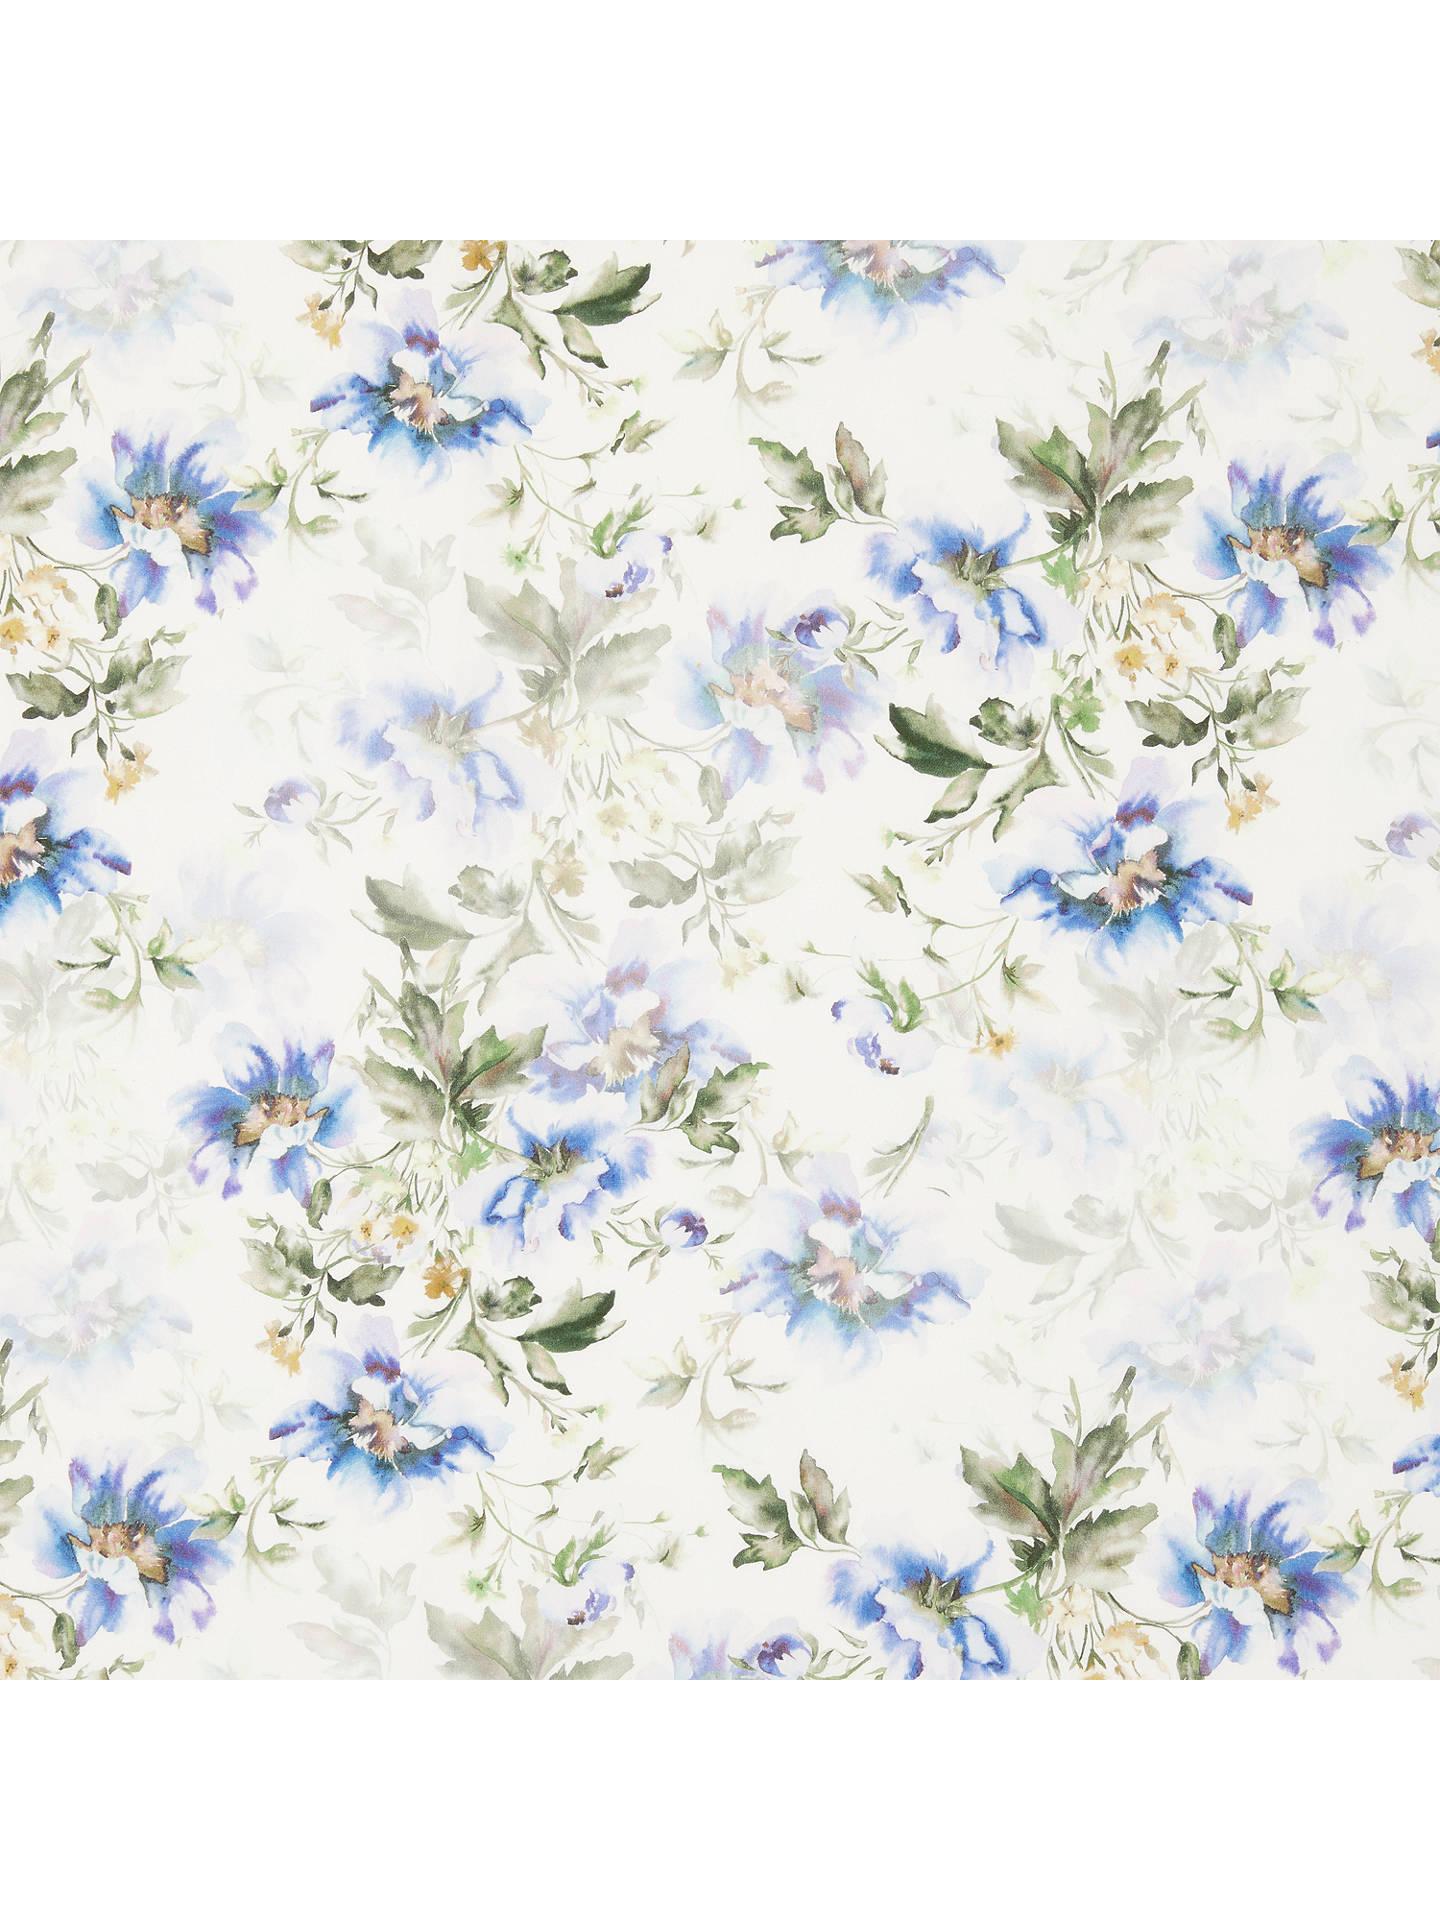 John lewis watercolour flowers print fabric whiteblue at john buyjohn lewis watercolour flowers print fabric whiteblue online at johnlewis mightylinksfo